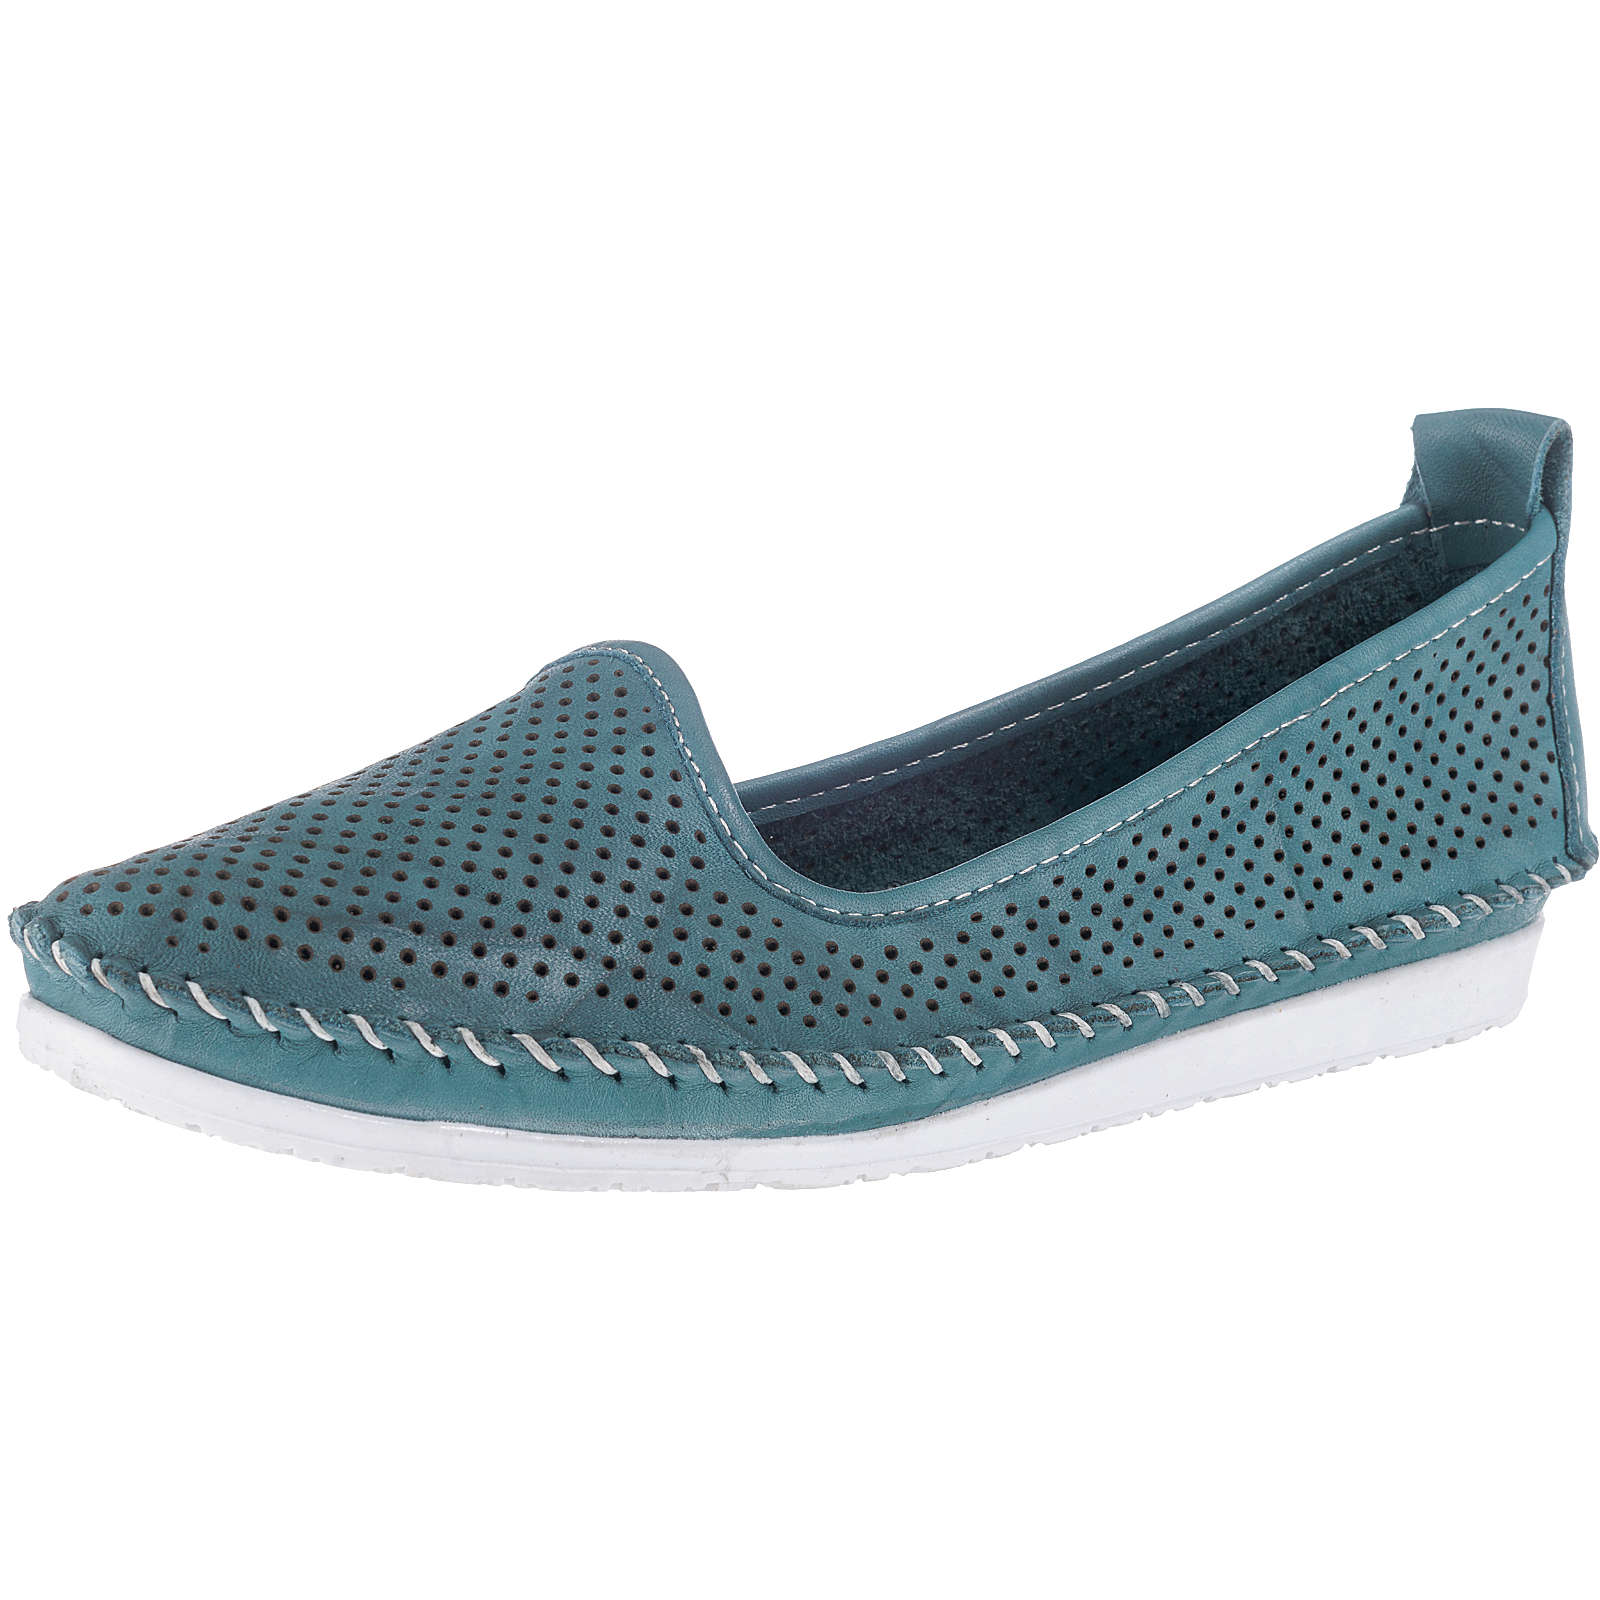 Andrea Conti Klassische Slipper blau Damen Gr. 42 jetztbilligerkaufen